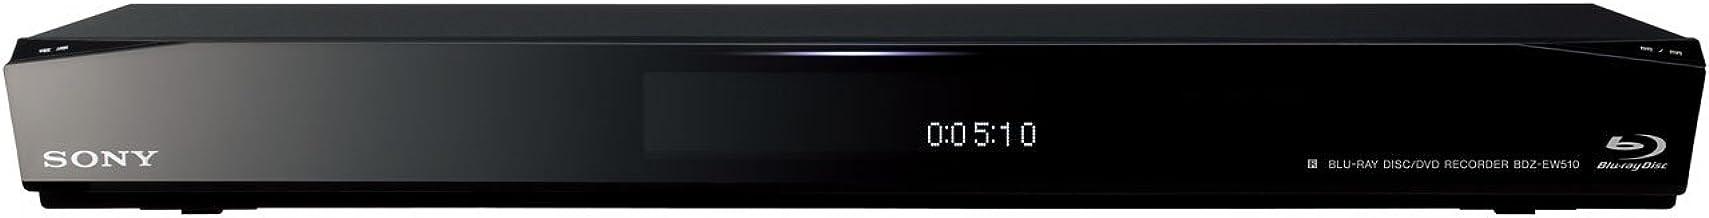 SONY 500GB 2チューナー ブルーレイレコーダー BDZ-EW510